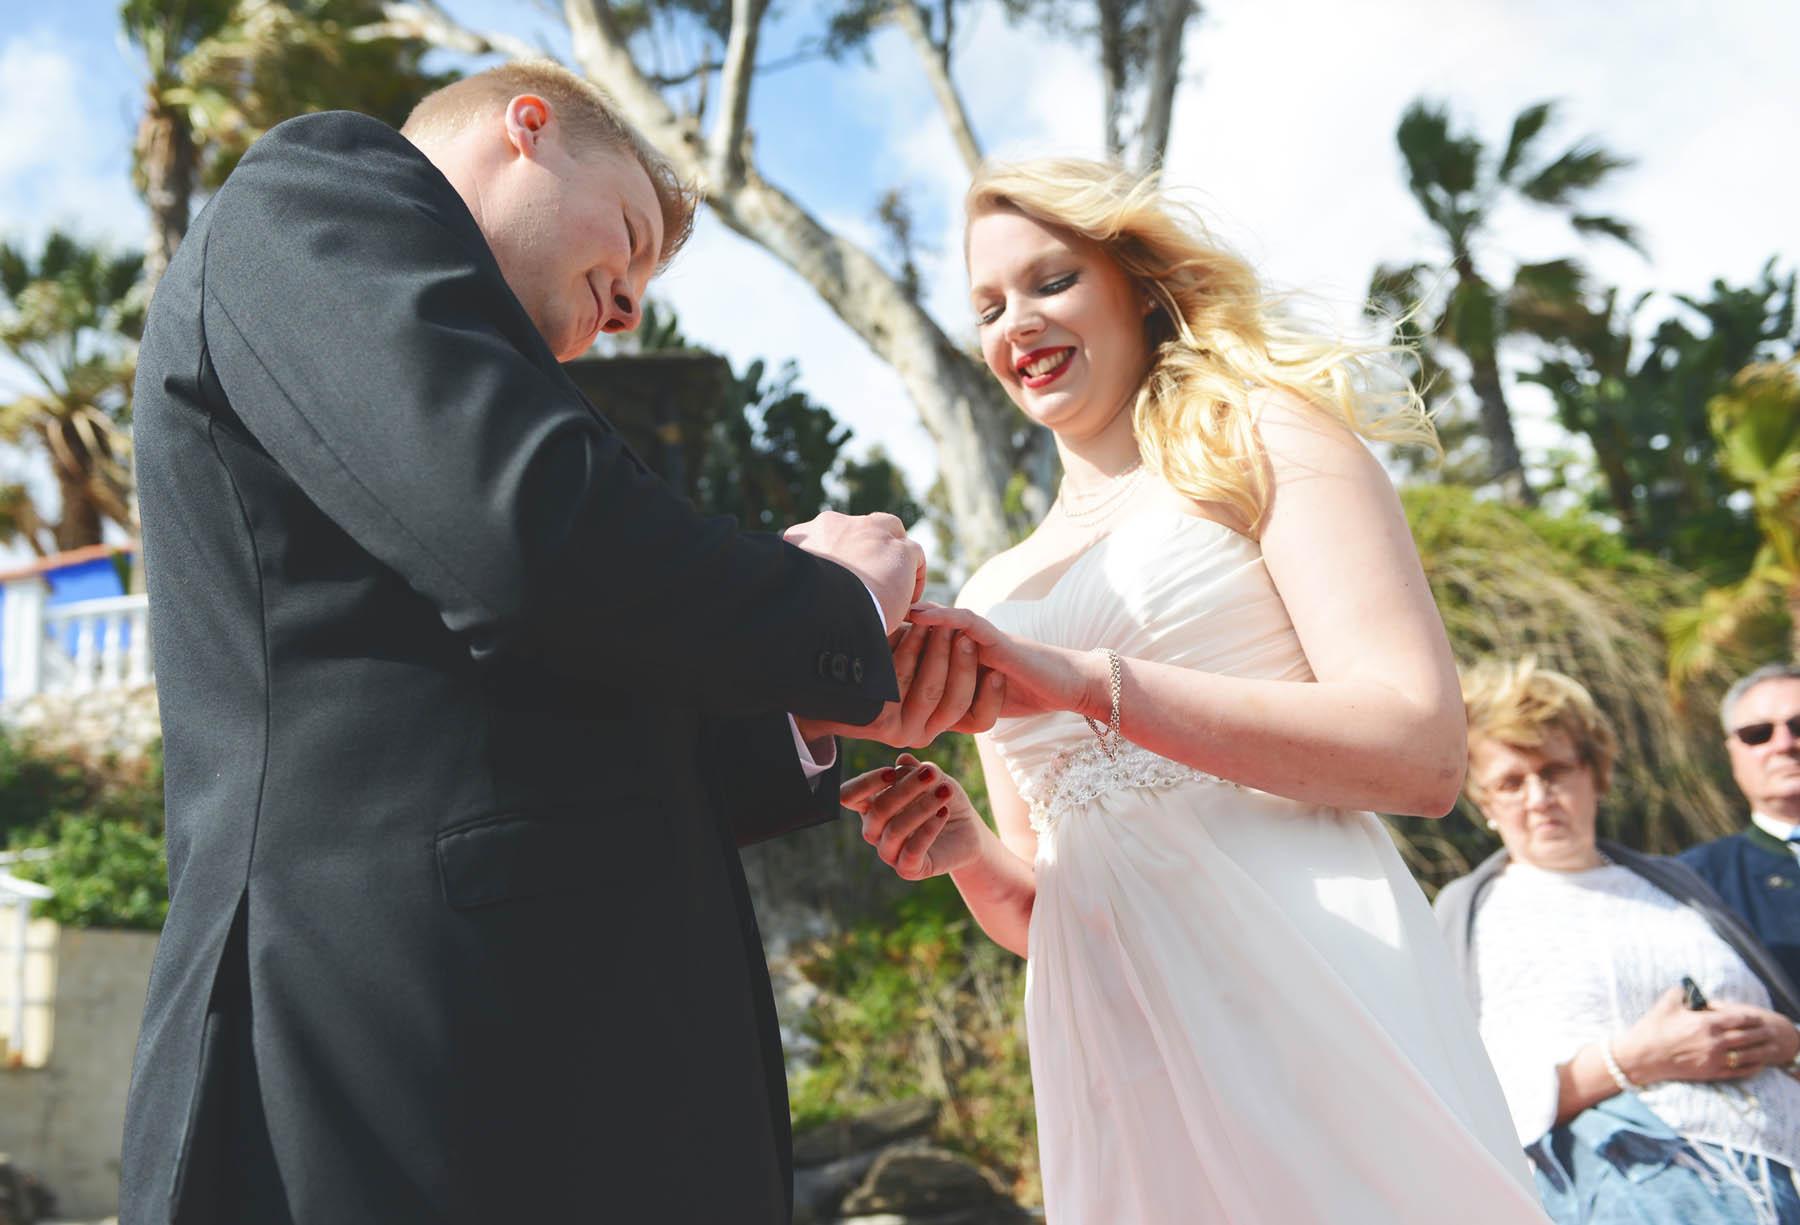 Swedish marbella beach weddings